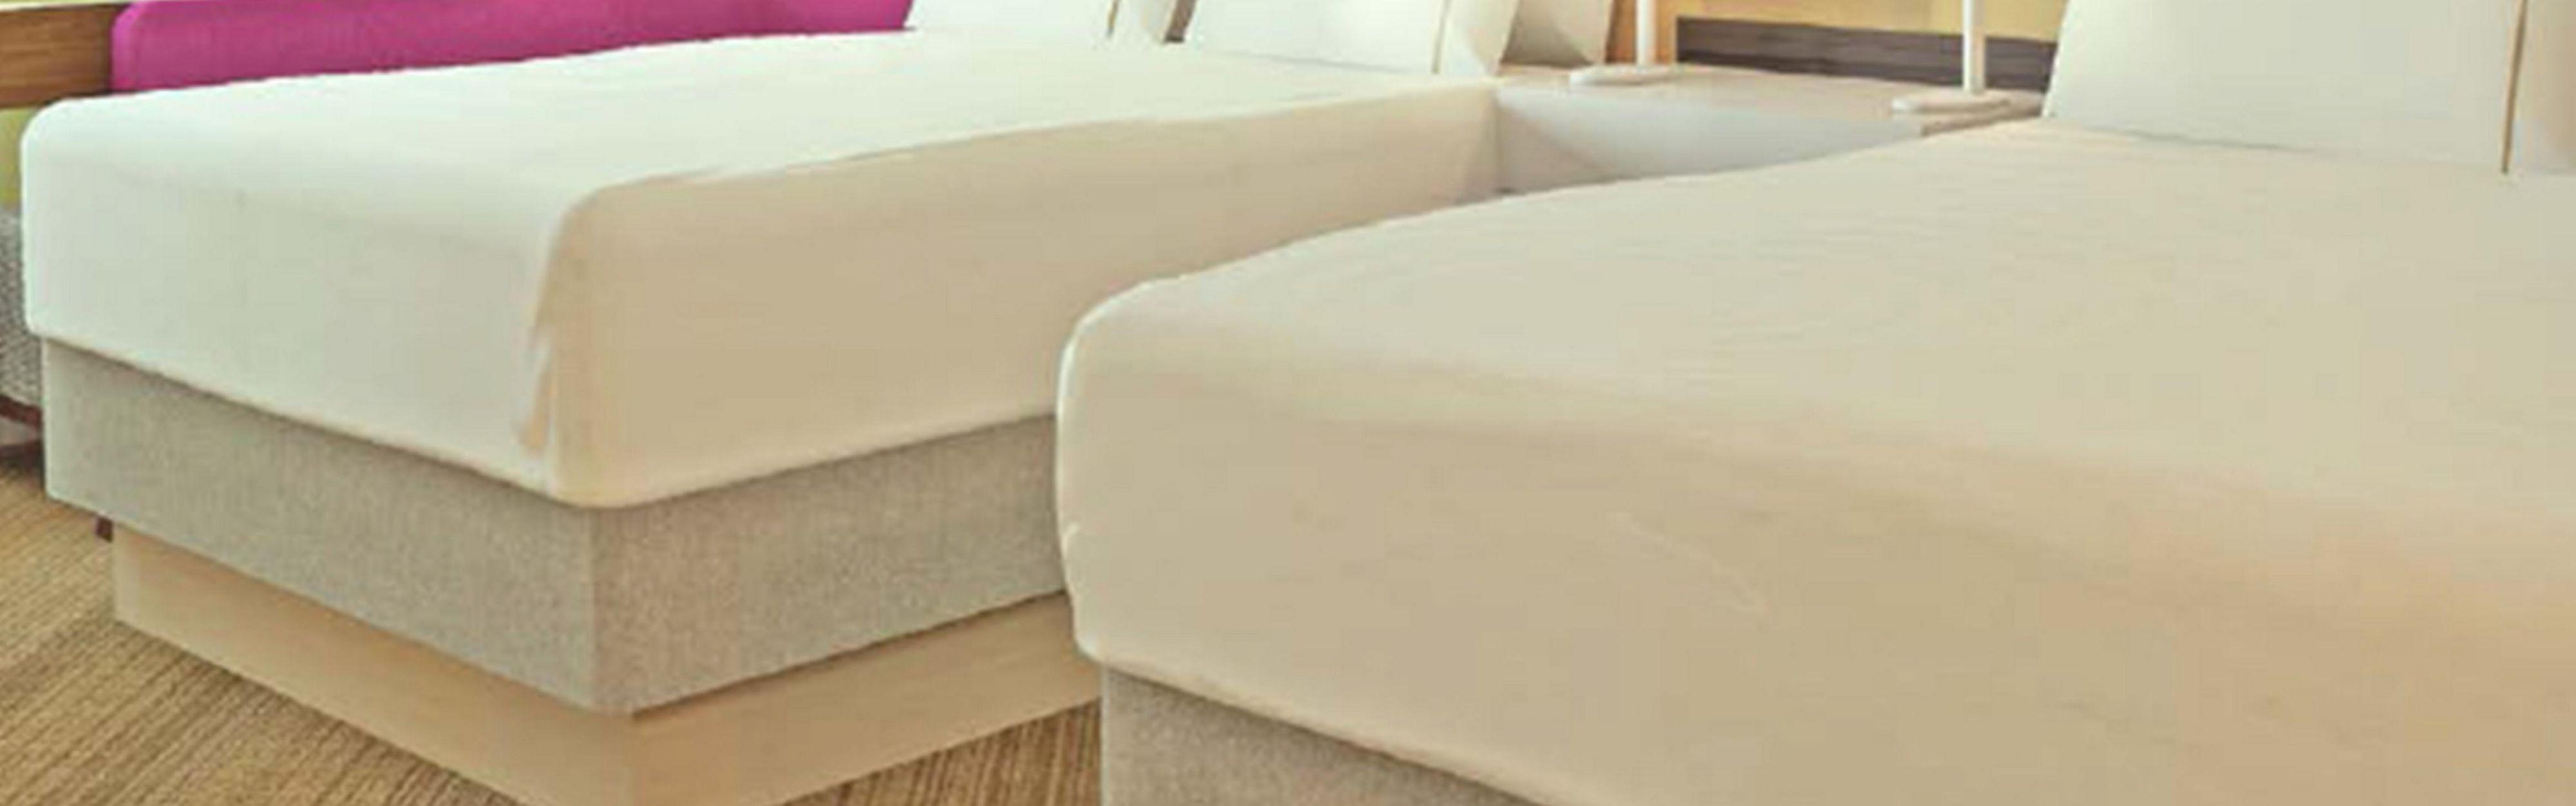 Holiday Inn Express & Suites Camarillo image 1